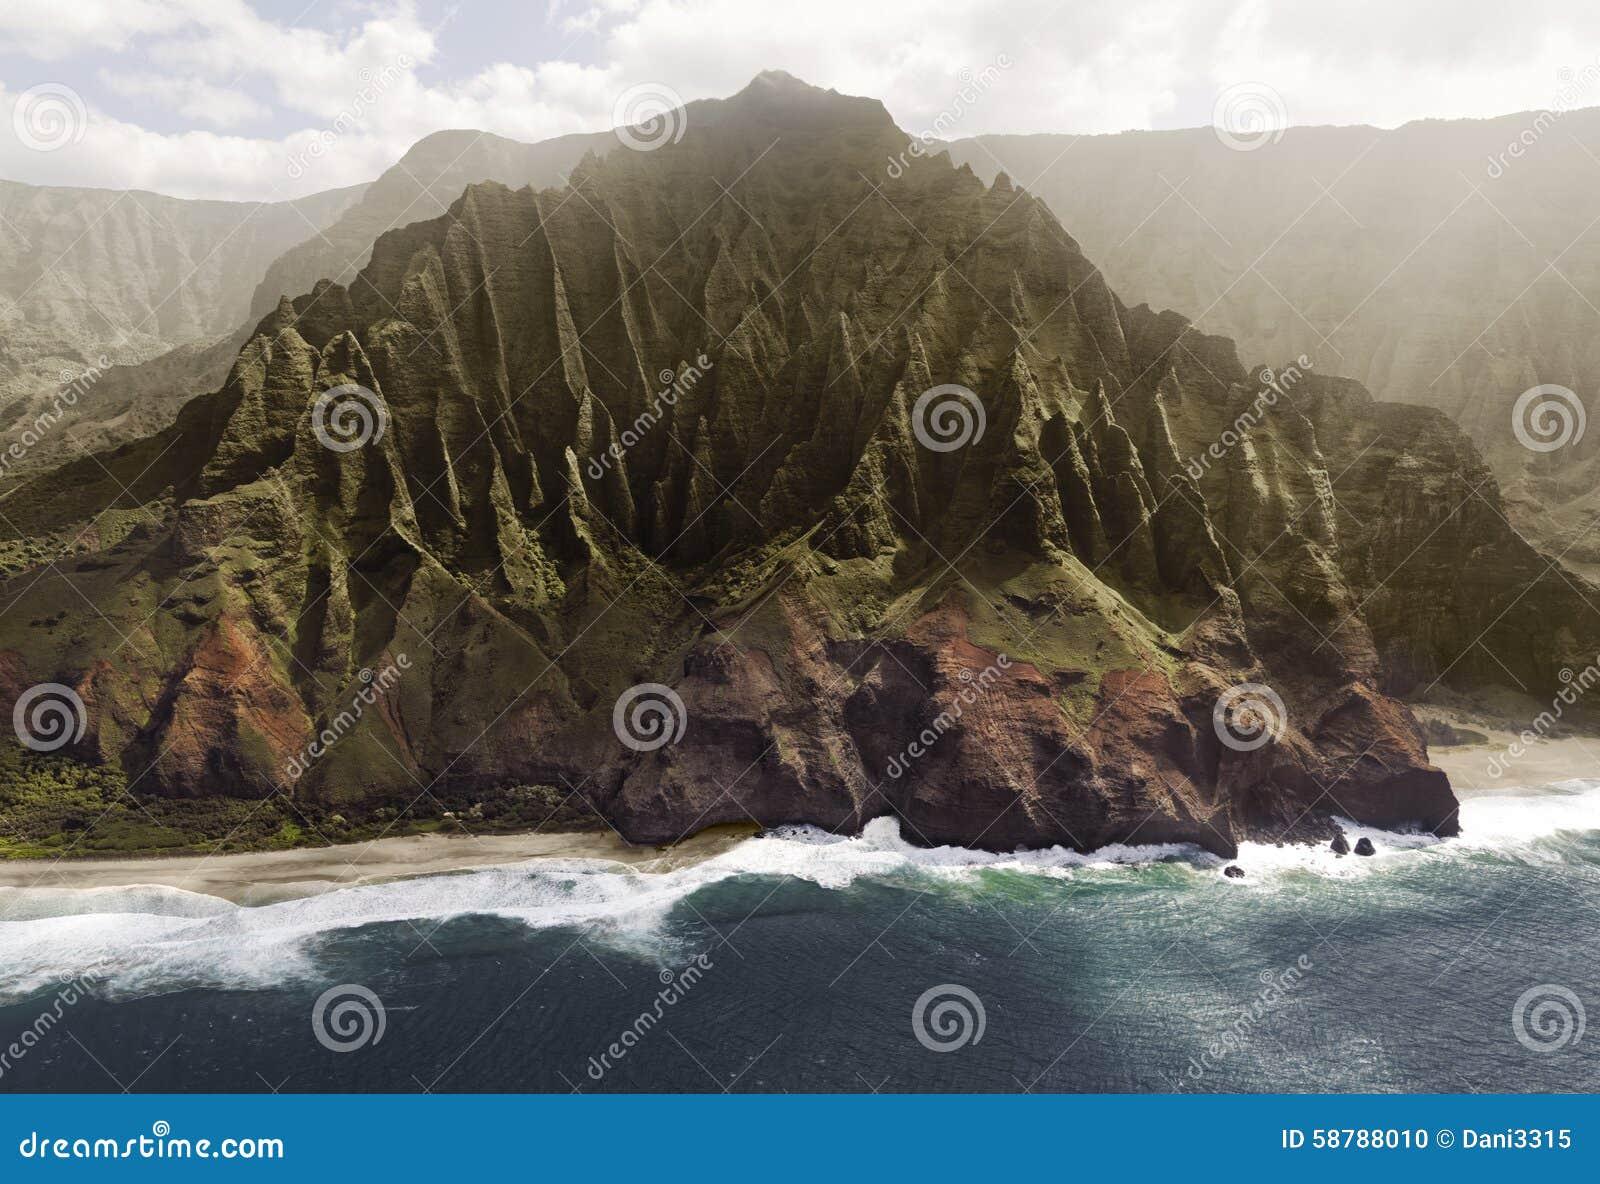 Na梵语海岸鸟瞰图在考艾岛海岛,夏威夷上的